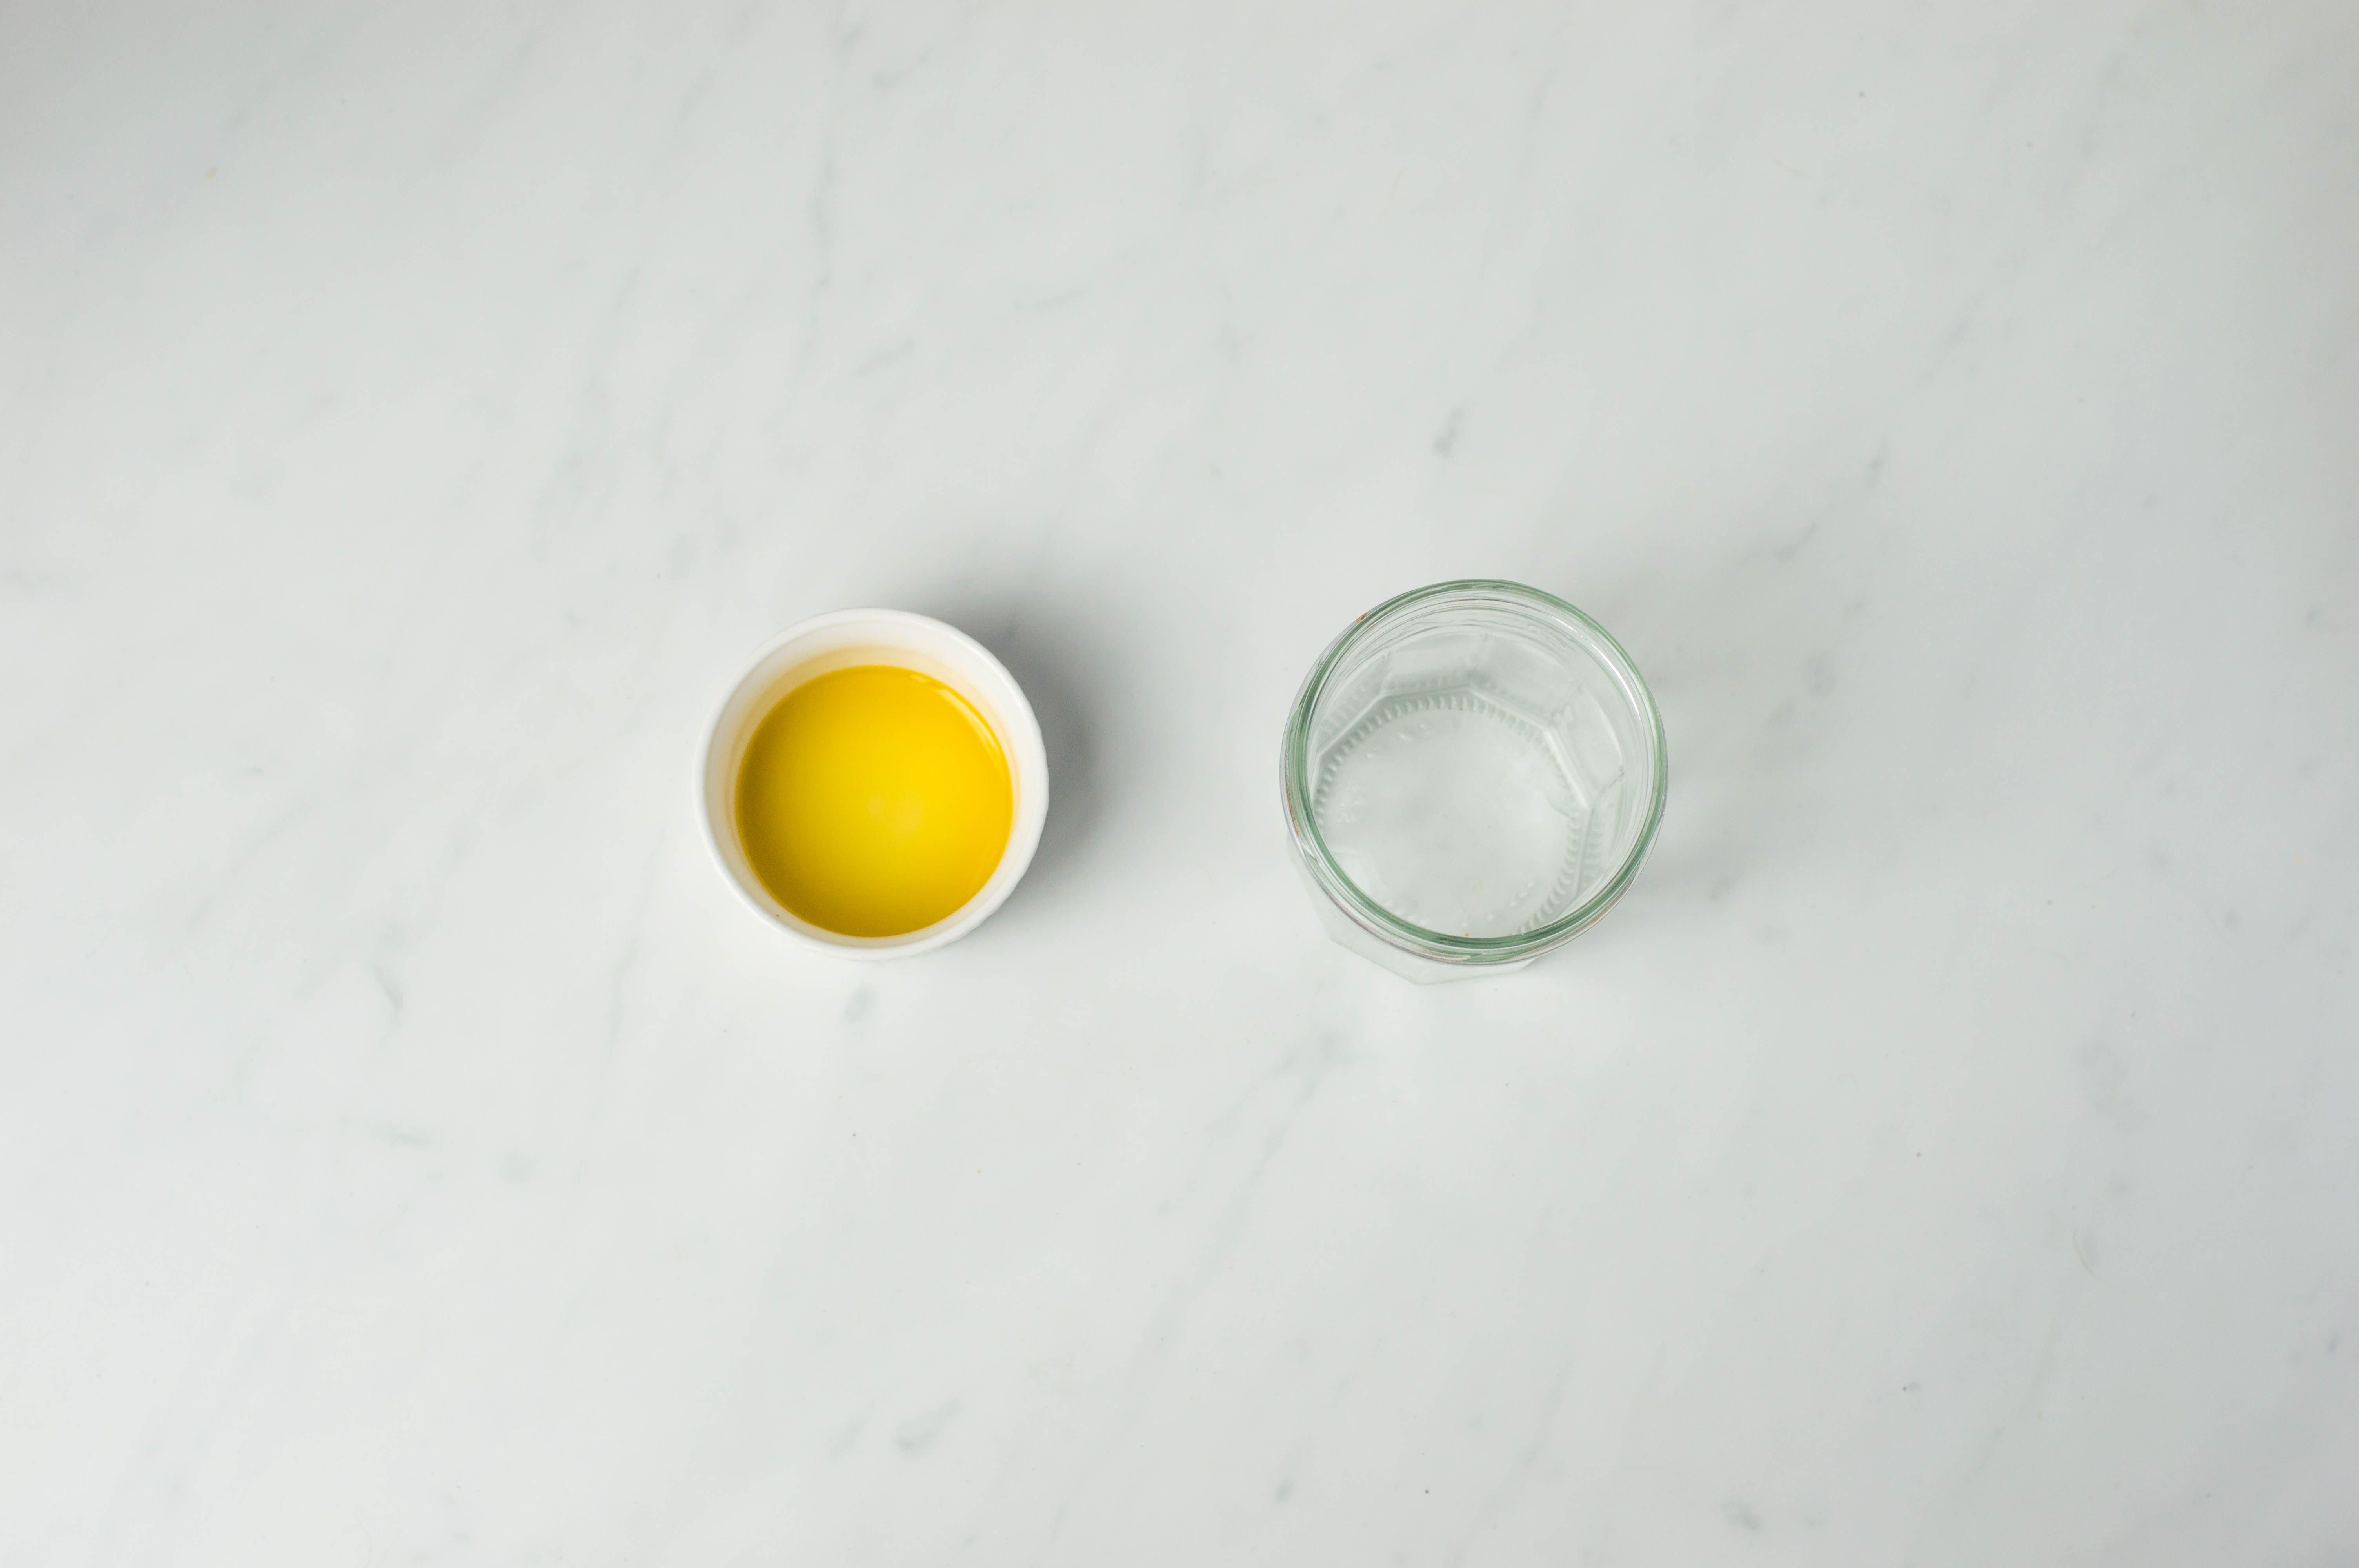 Jam jars and olive oil